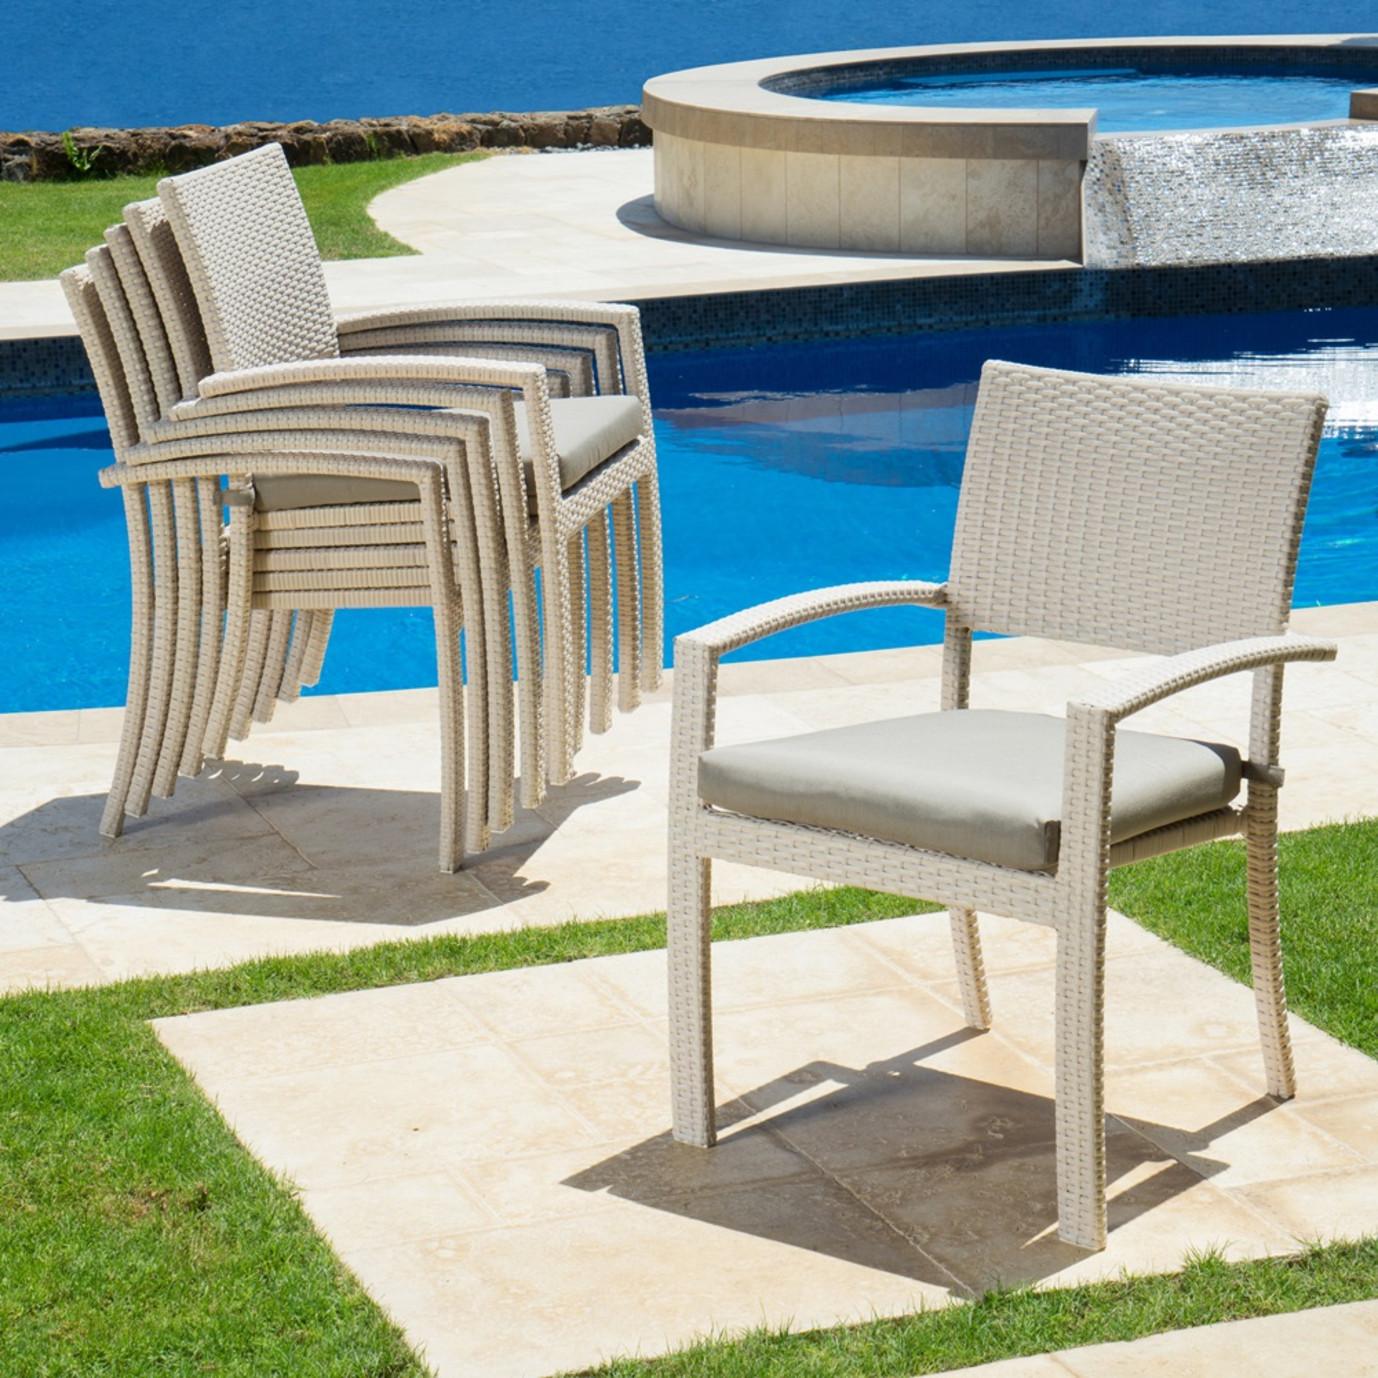 Portofino™ Comfort 6pk Dining Chairs - Kona Taupe